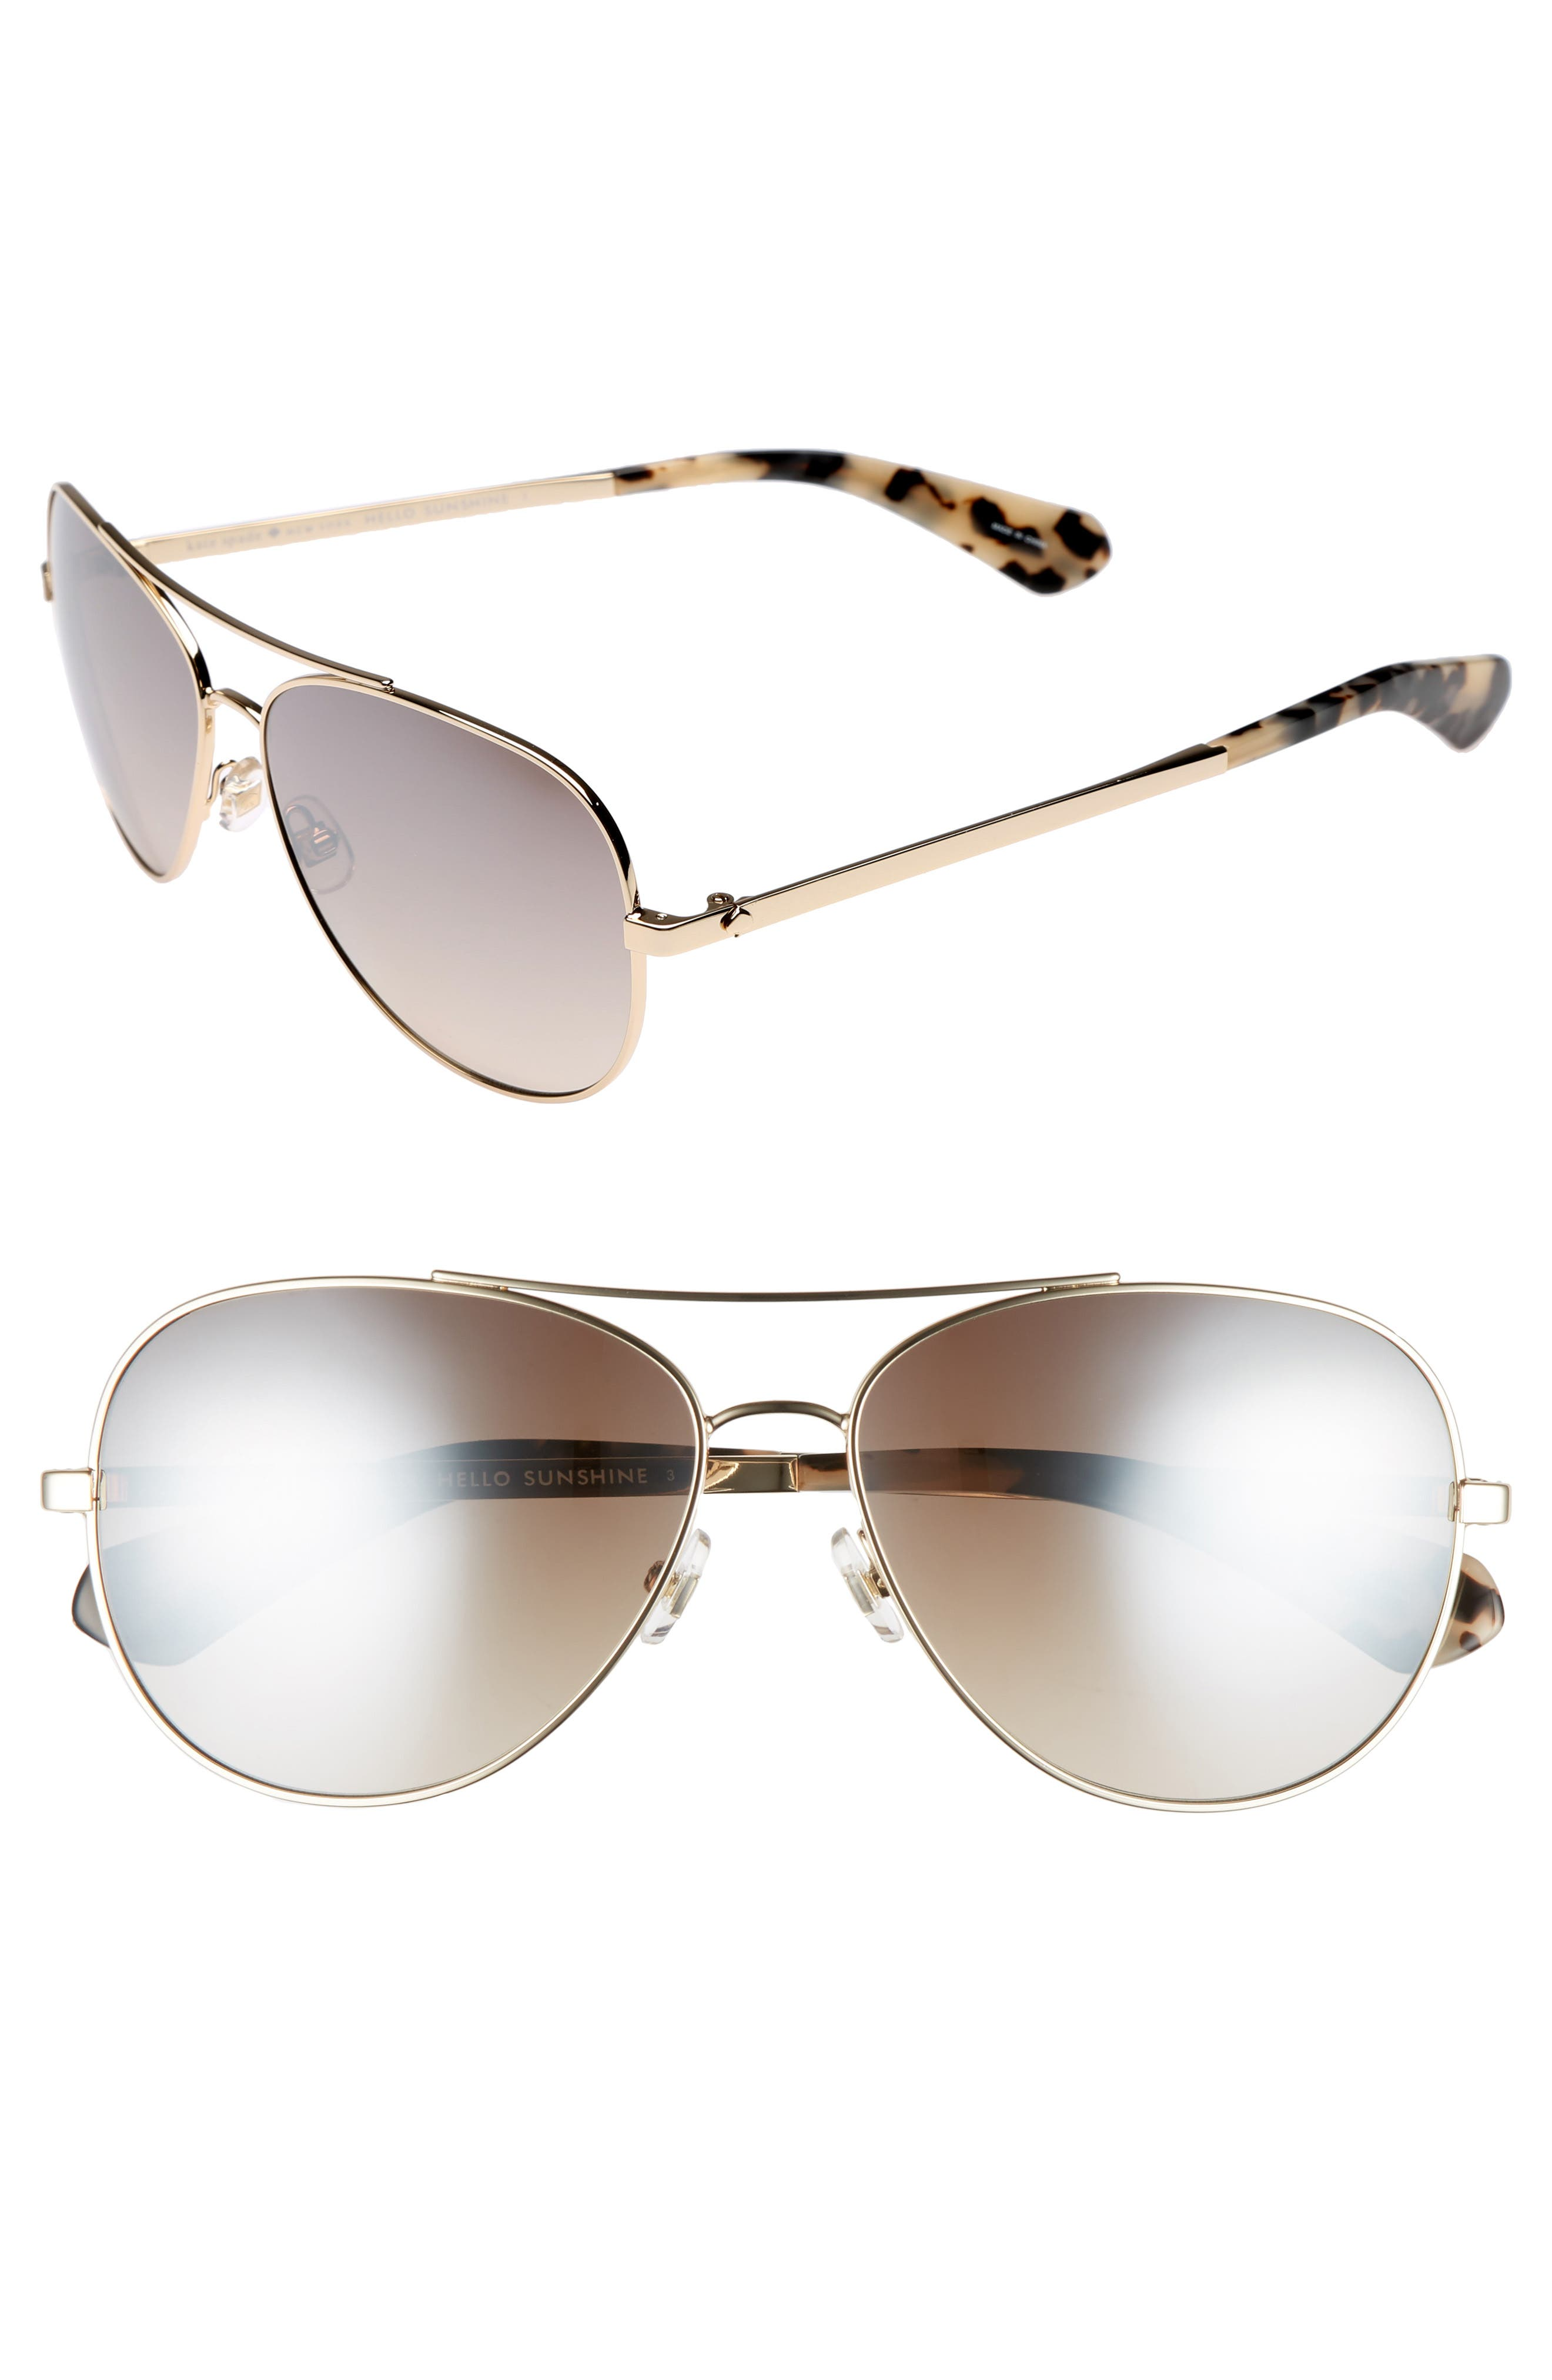 avaline 58mm aviator sunglasses,                             Main thumbnail 1, color,                             GOLD HAVANA